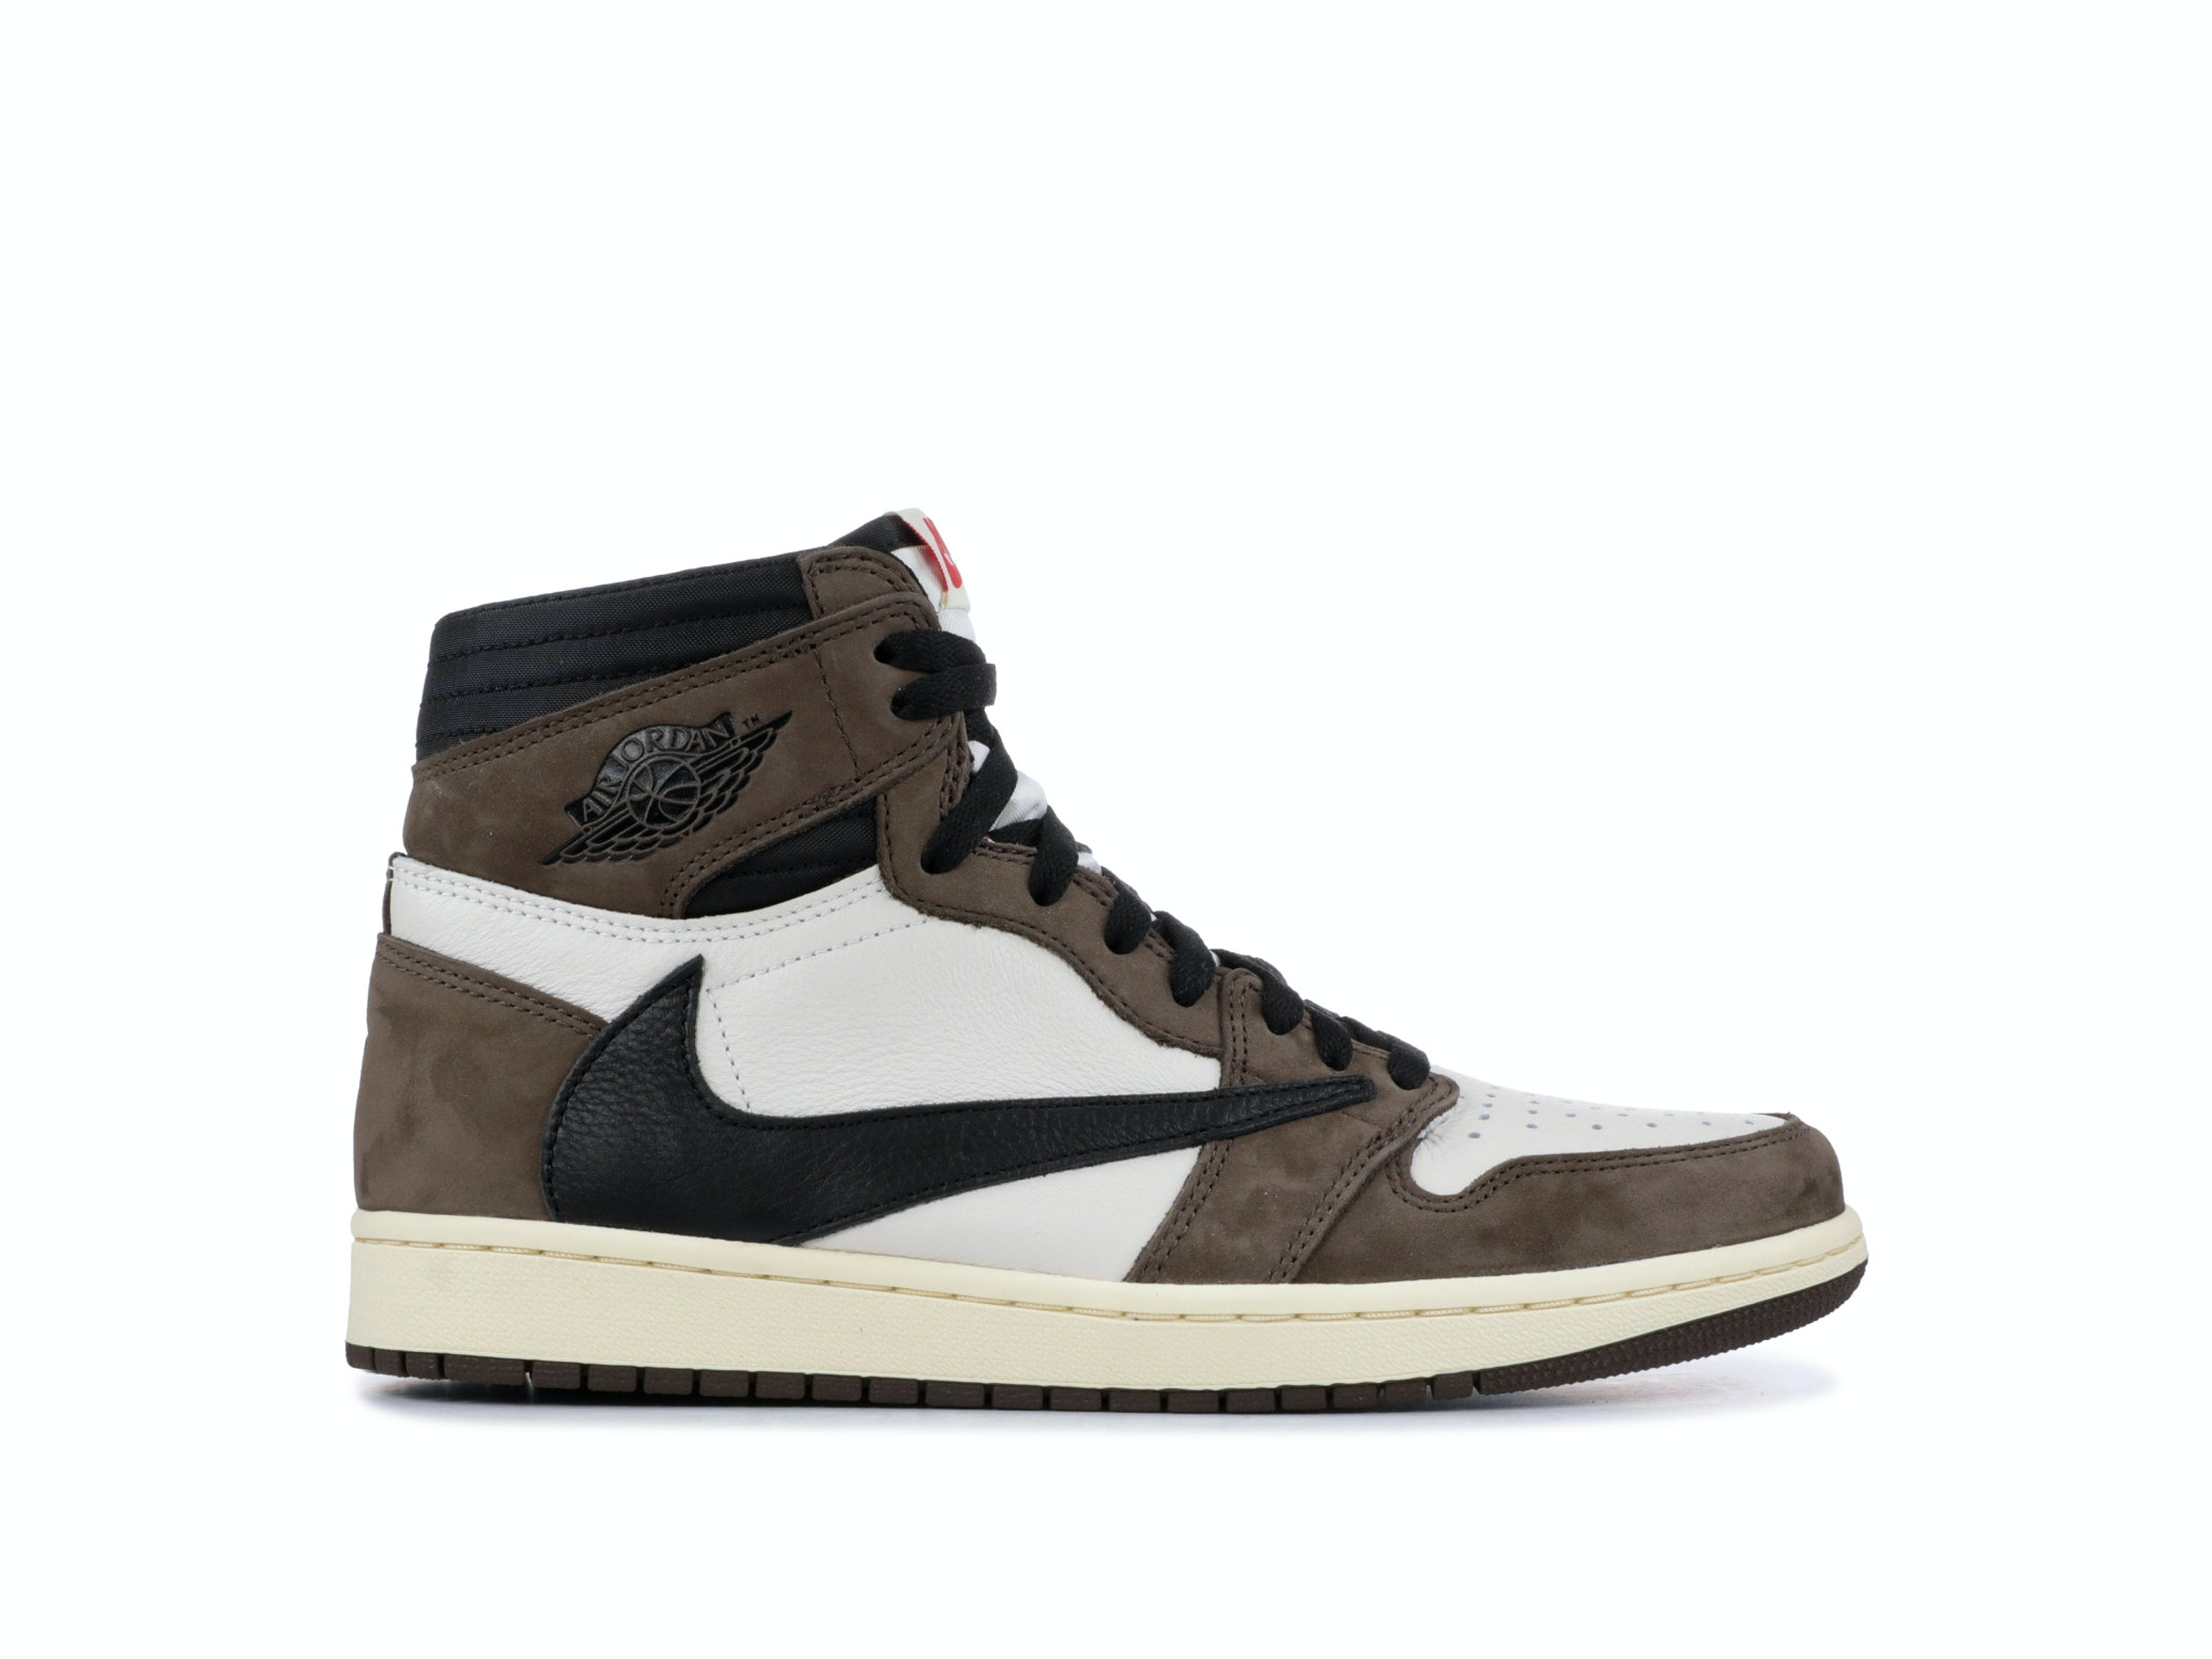 new styles 17316 1dcd5 Travis Scott x Air Jordan 1 Retro High OG  Mocha